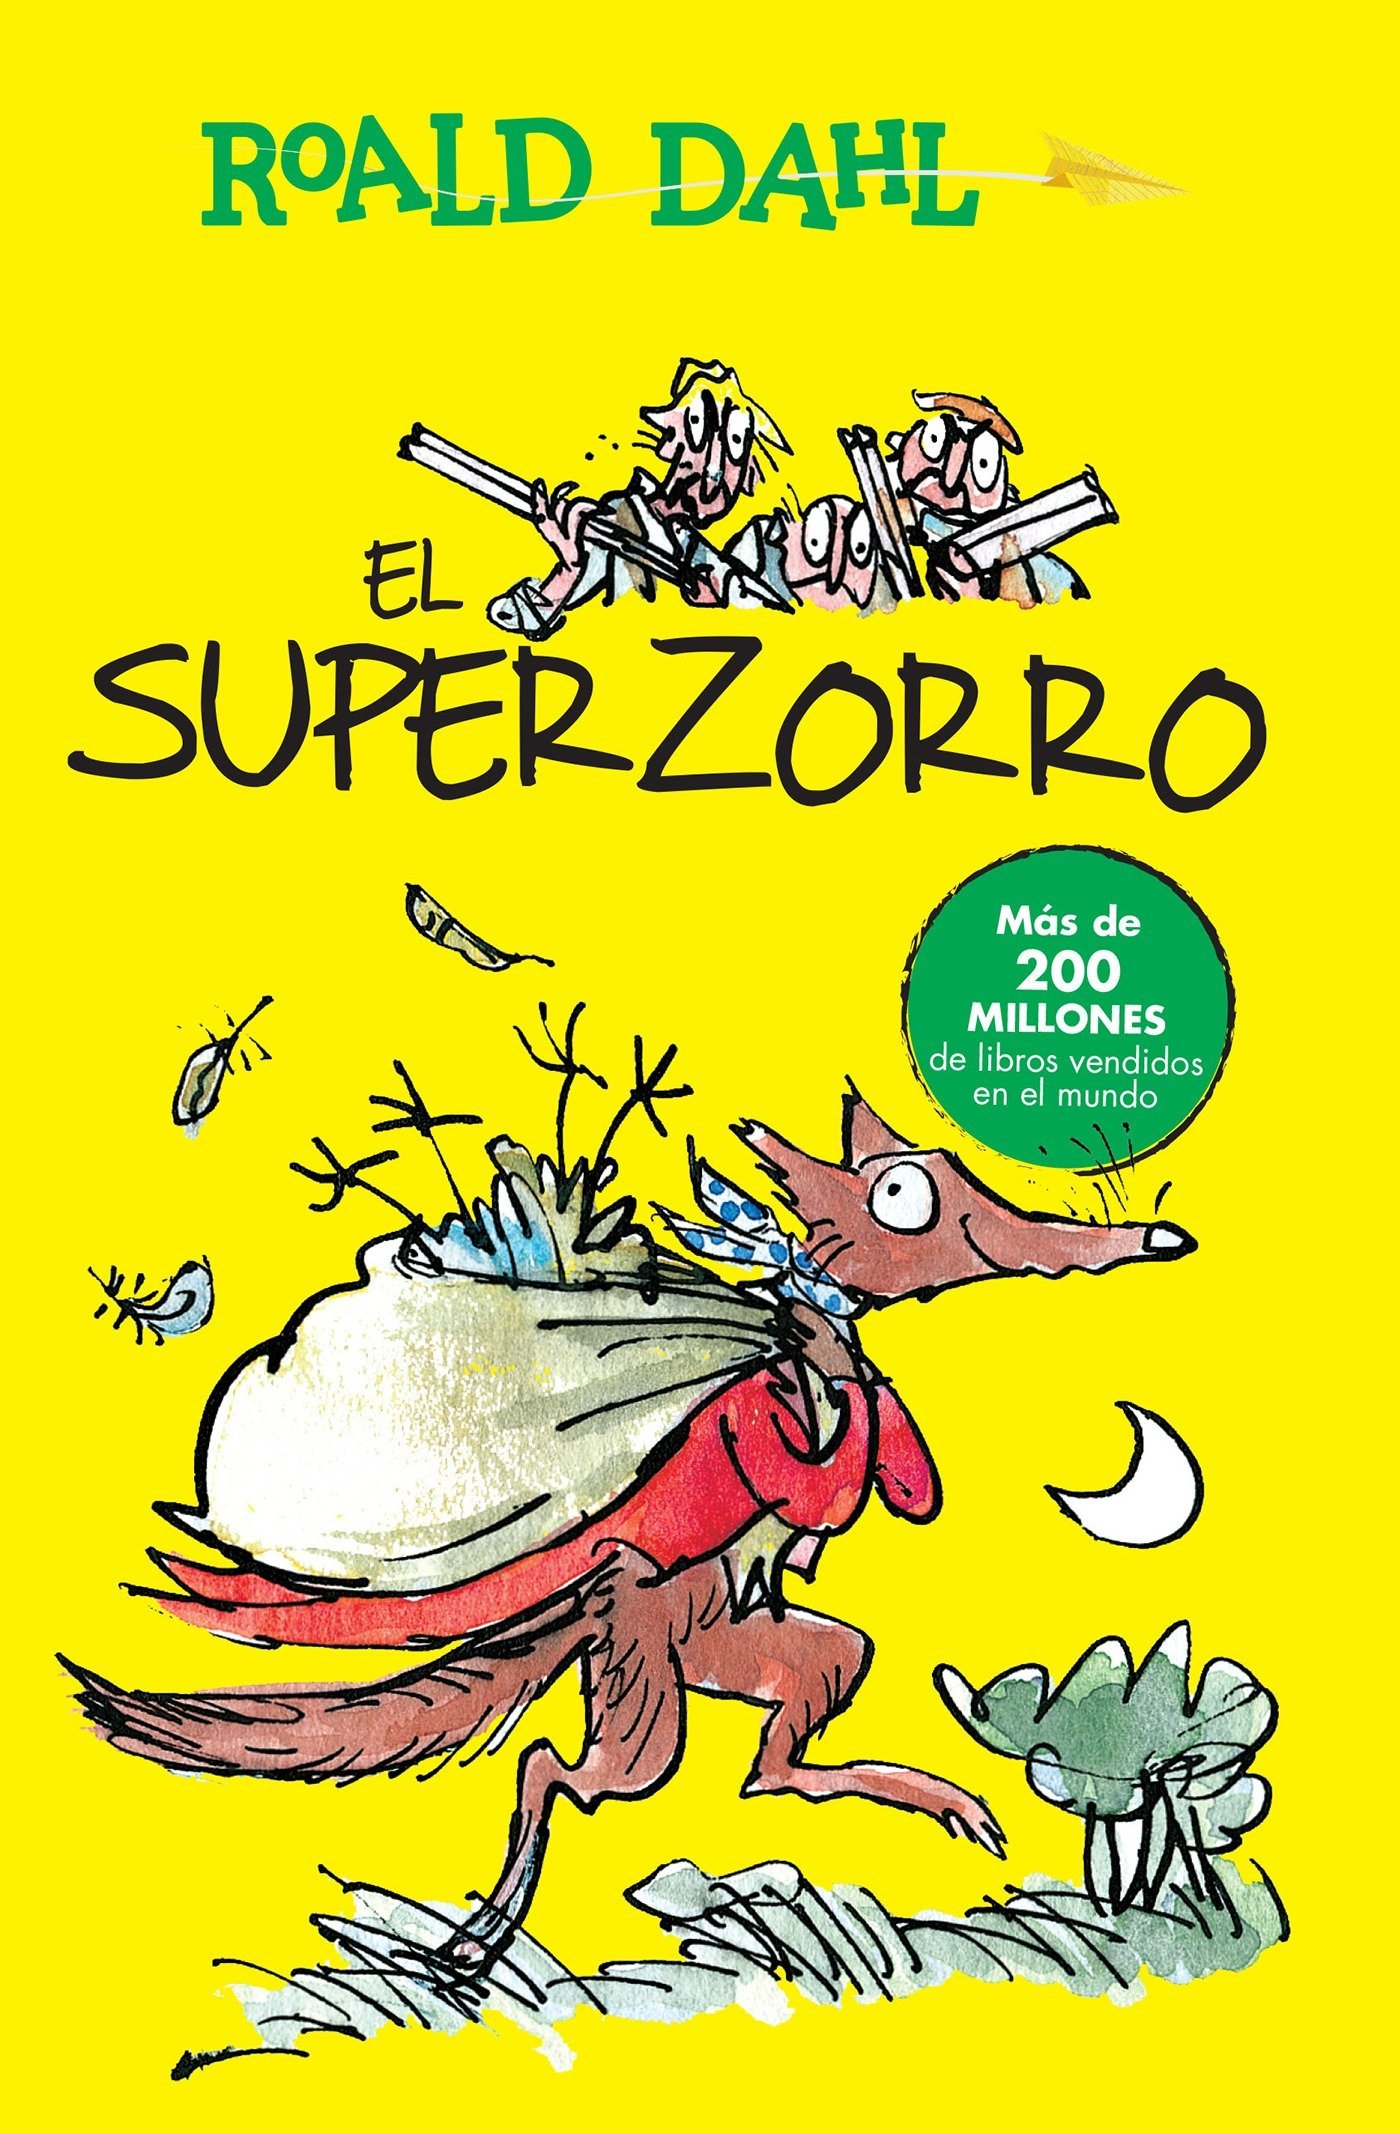 El Superzorro Fantastic Mr Fox Coleccion Roald Dahl Spanish Edition Dahl Roald 9786073140454 Amazon Com Books